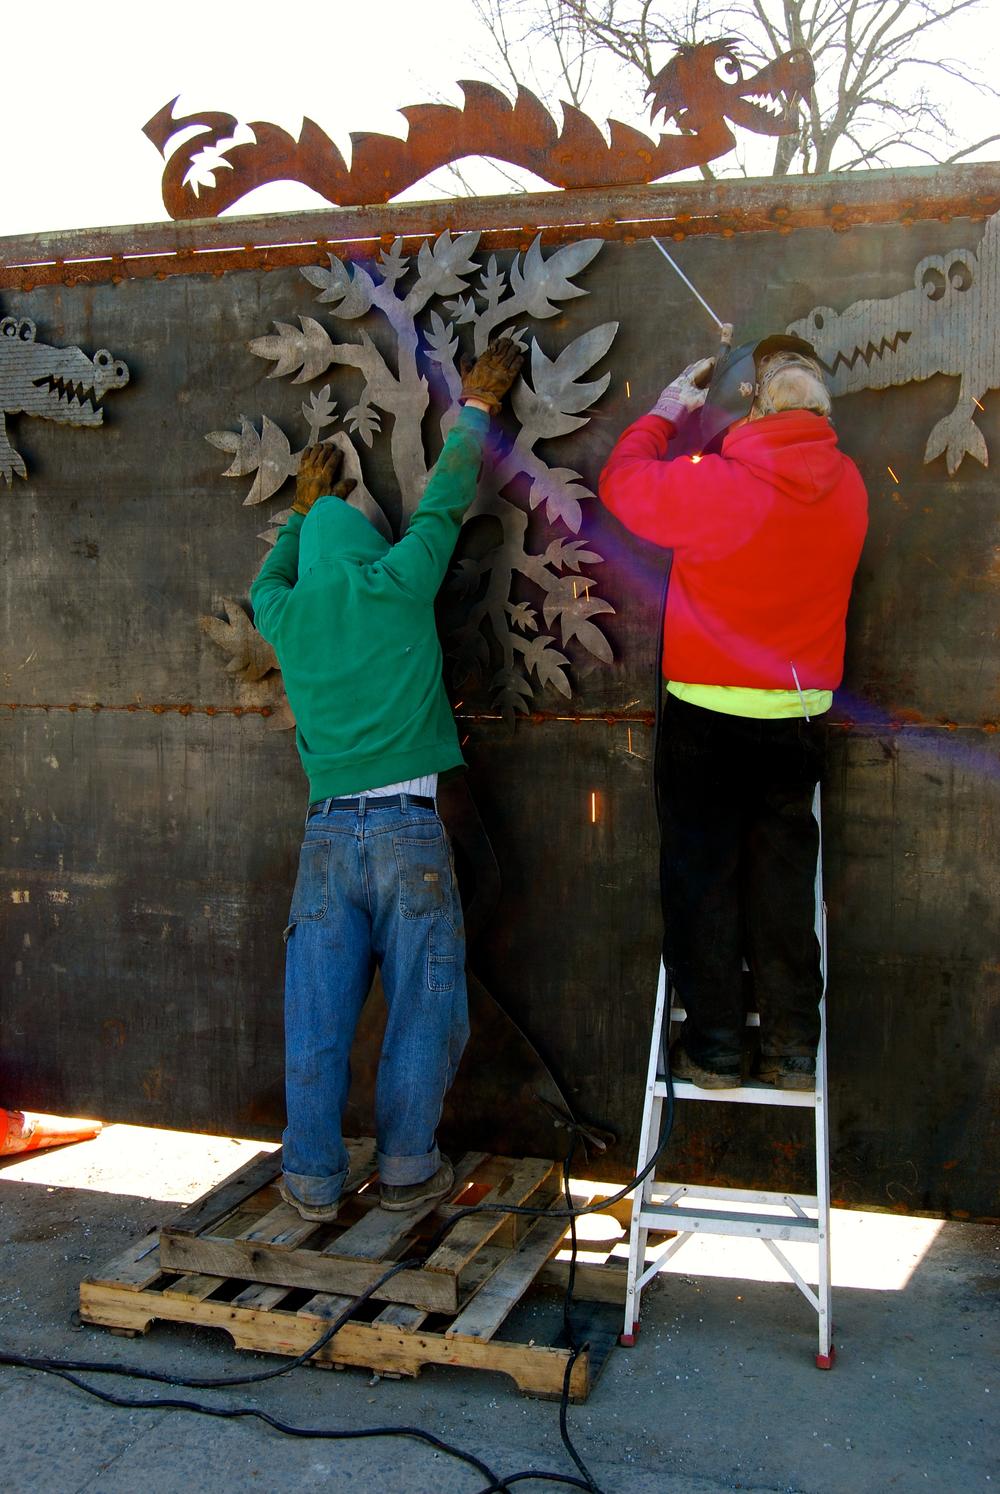 RB Scrap Iron Art Fence Work in Progress_April_4.jpg